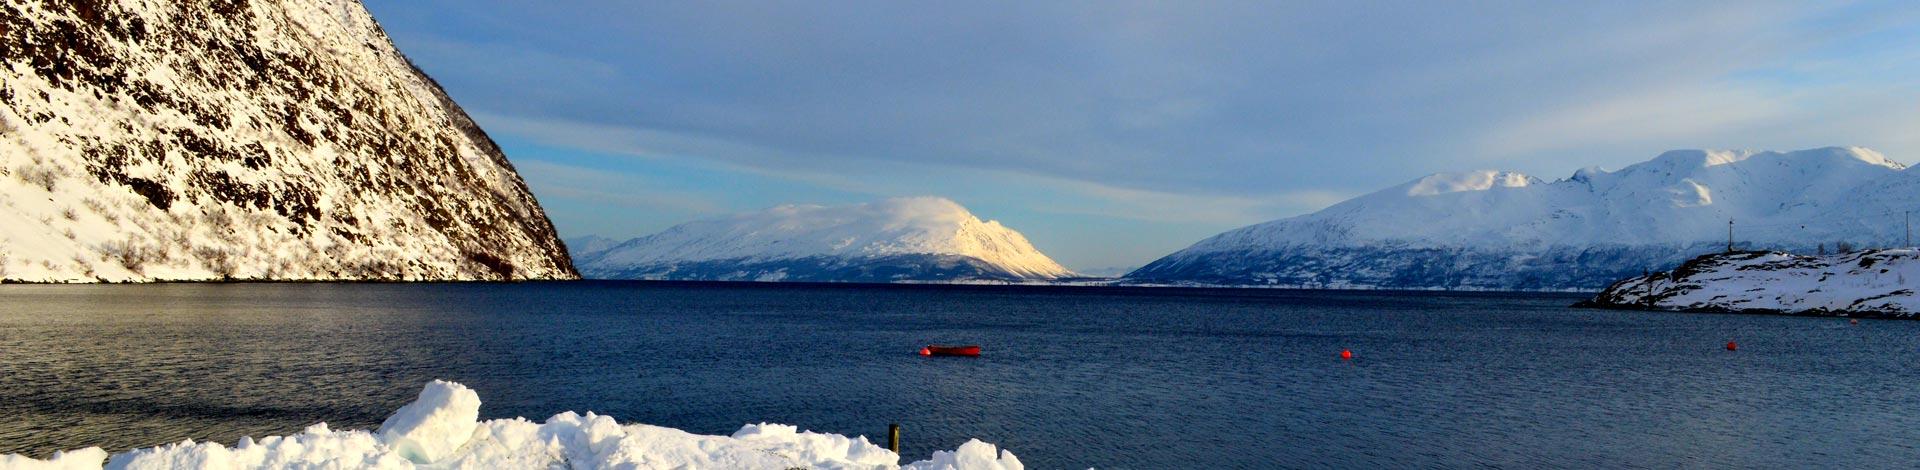 tolle-skitouren-in-den-lyngen-alpen-in-norwegen-mit-bergfuehrer